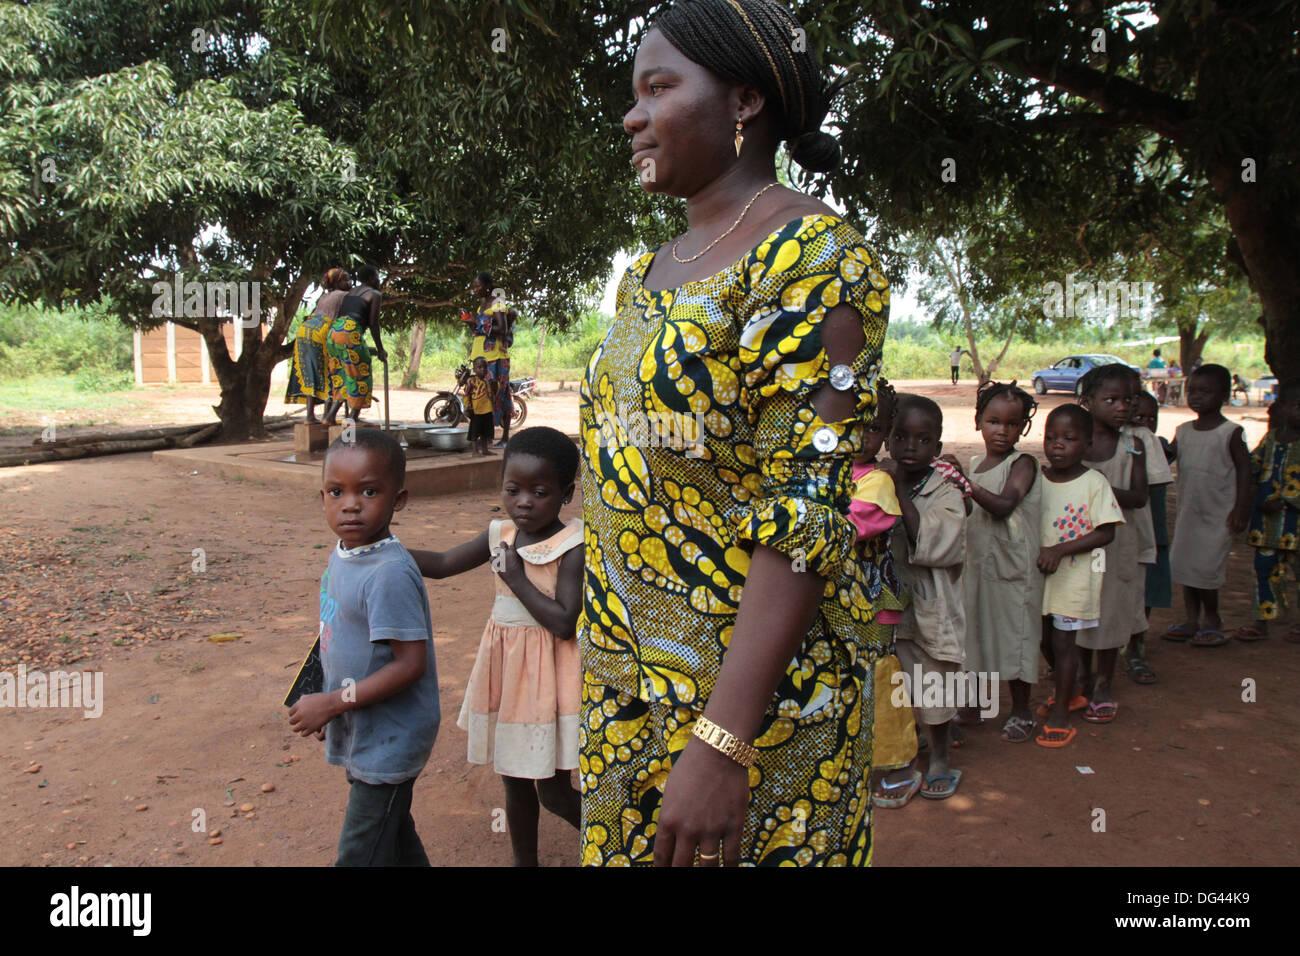 Lehrer begleiten Schüler, Schule, Hevie, Benin, Westafrika, Afrika Stockbild